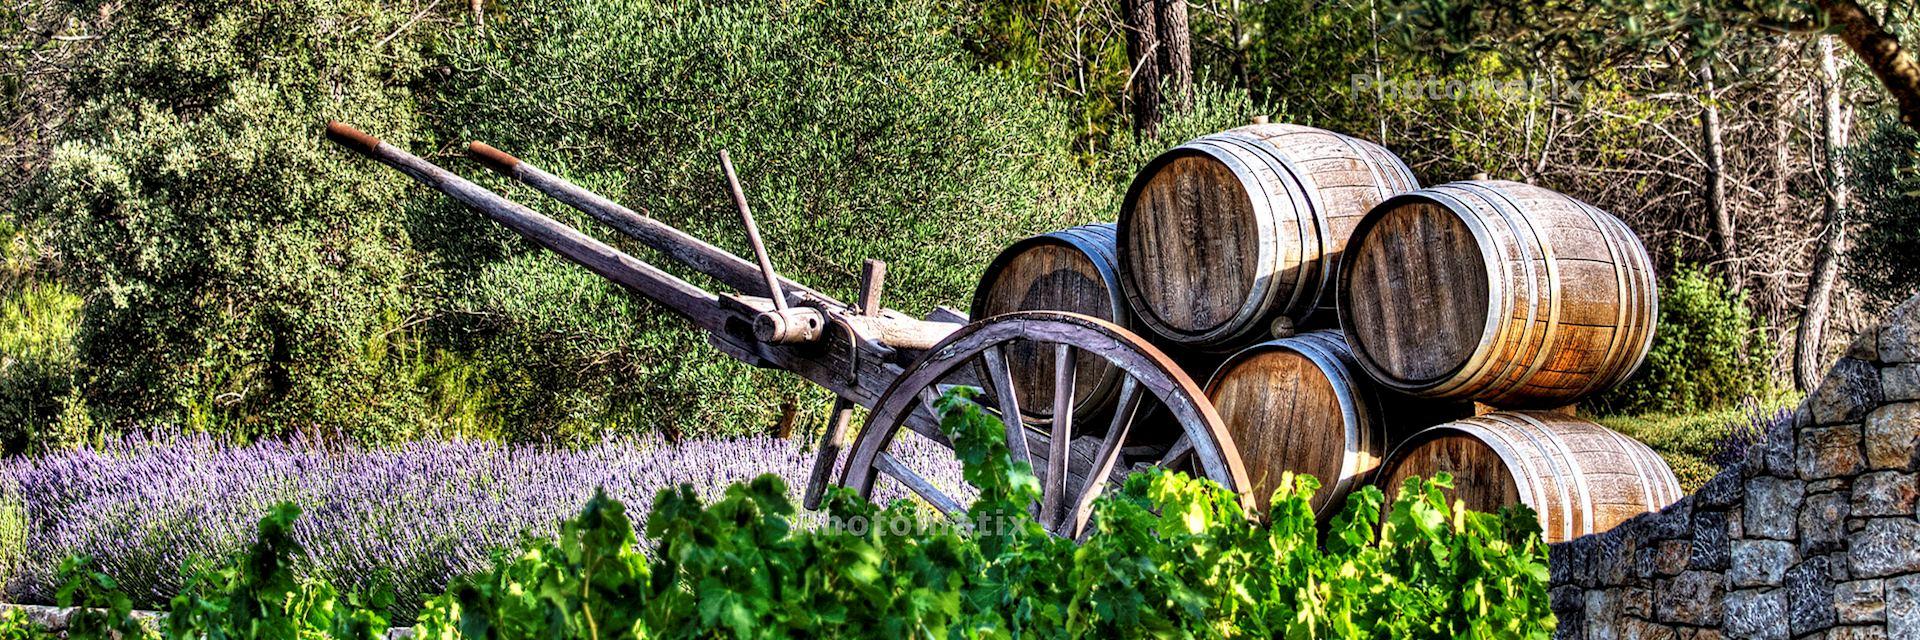 Barrels in a wine-growing property in France